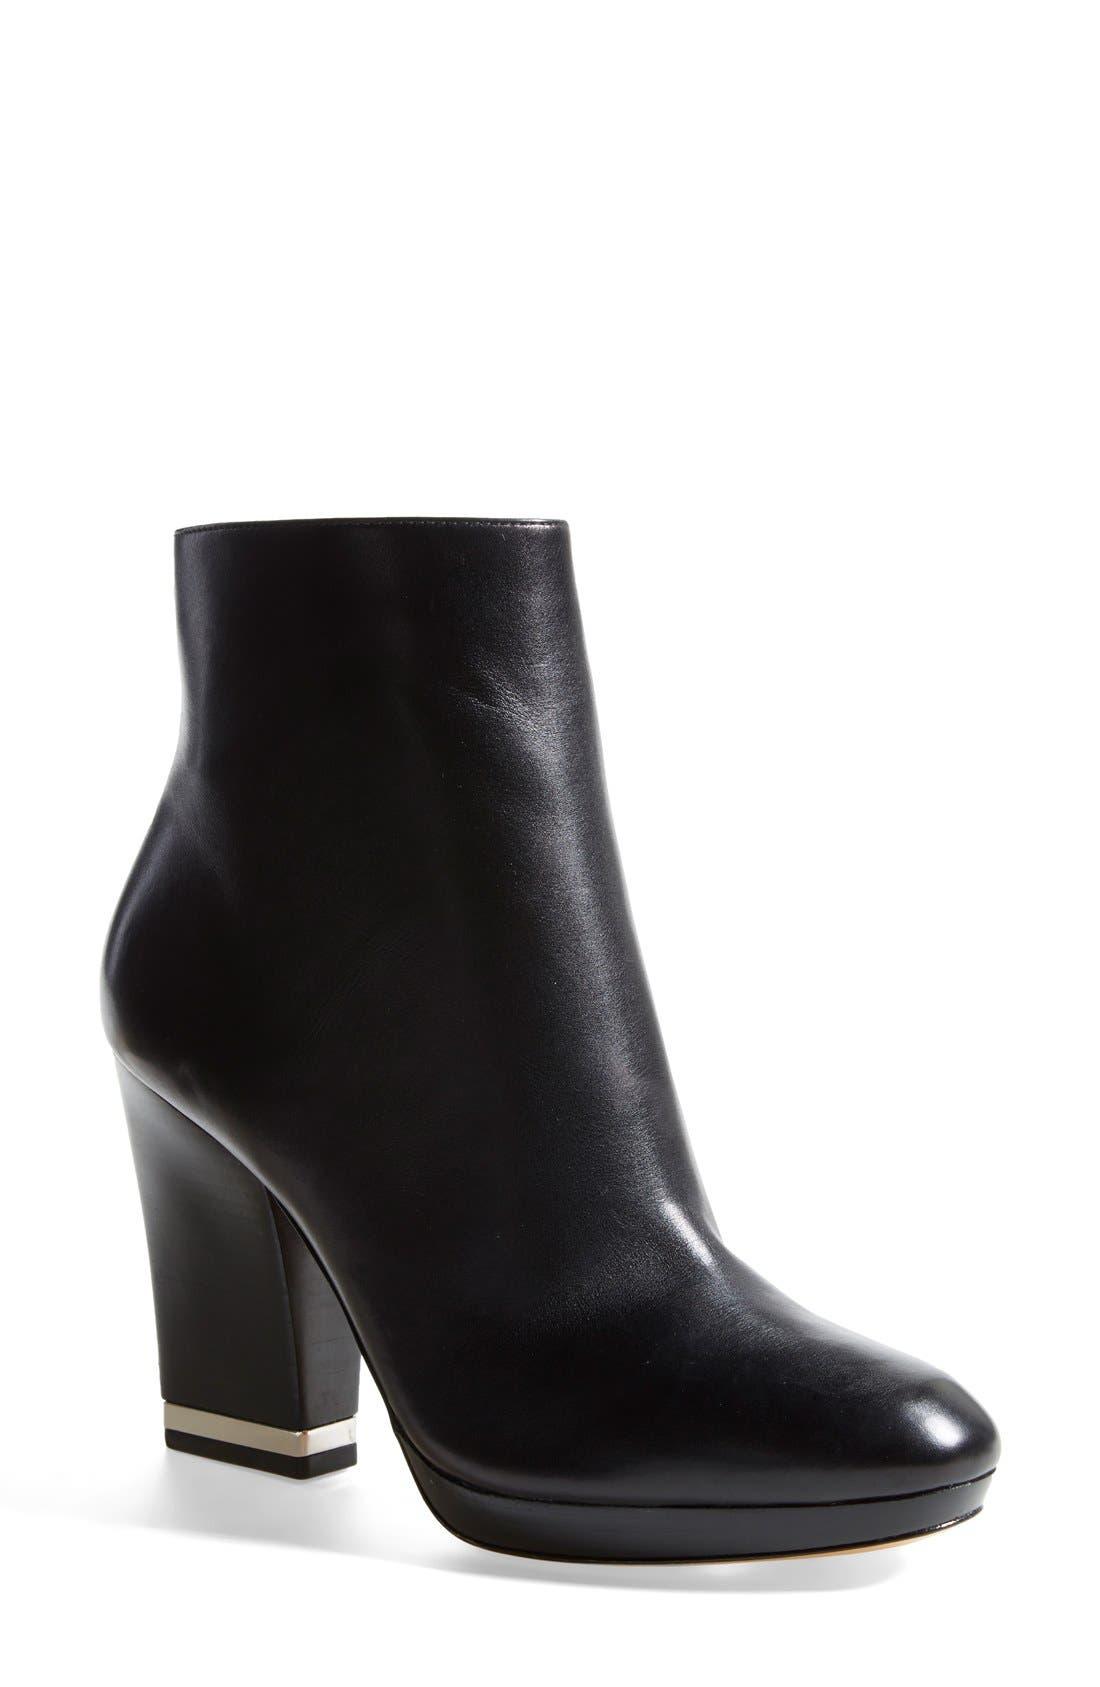 Main Image - Michael Kors 'Catherine' Calfskin Leather Almond Toe Bootie (Women)